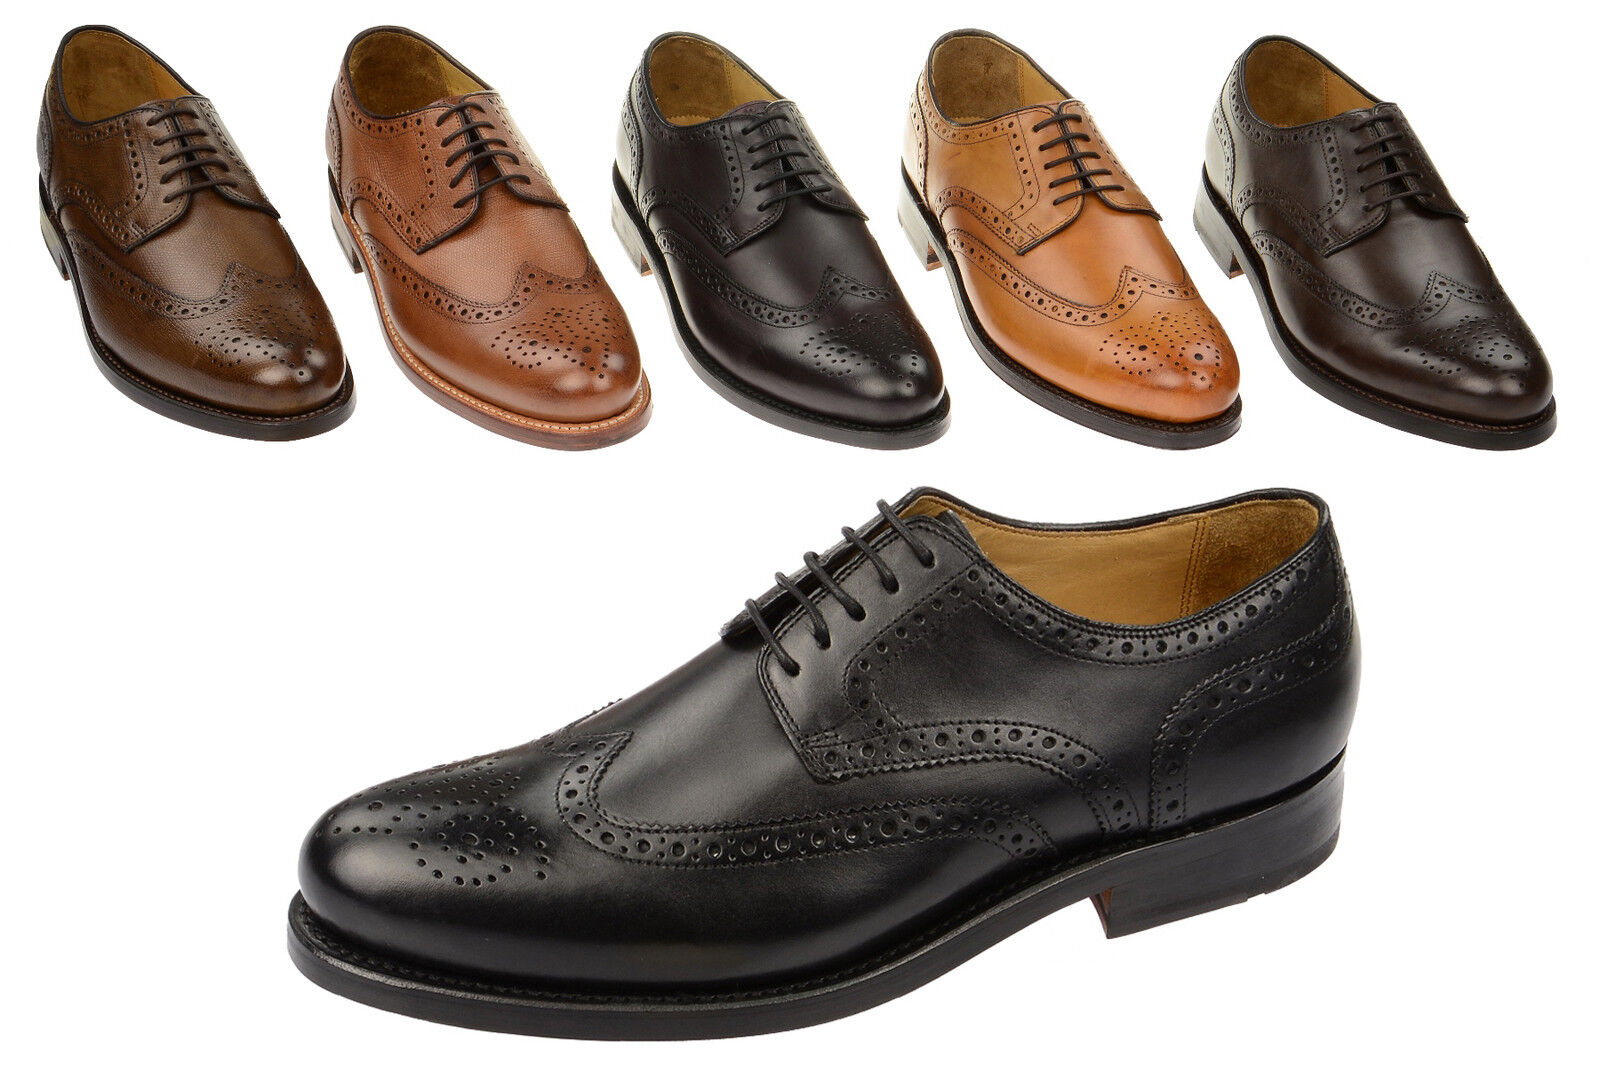 Rahmengenähte Schuhe & GoodYear Welted Ledersohle Gordon & Schuhe Bros Levet 2318 43a9dc